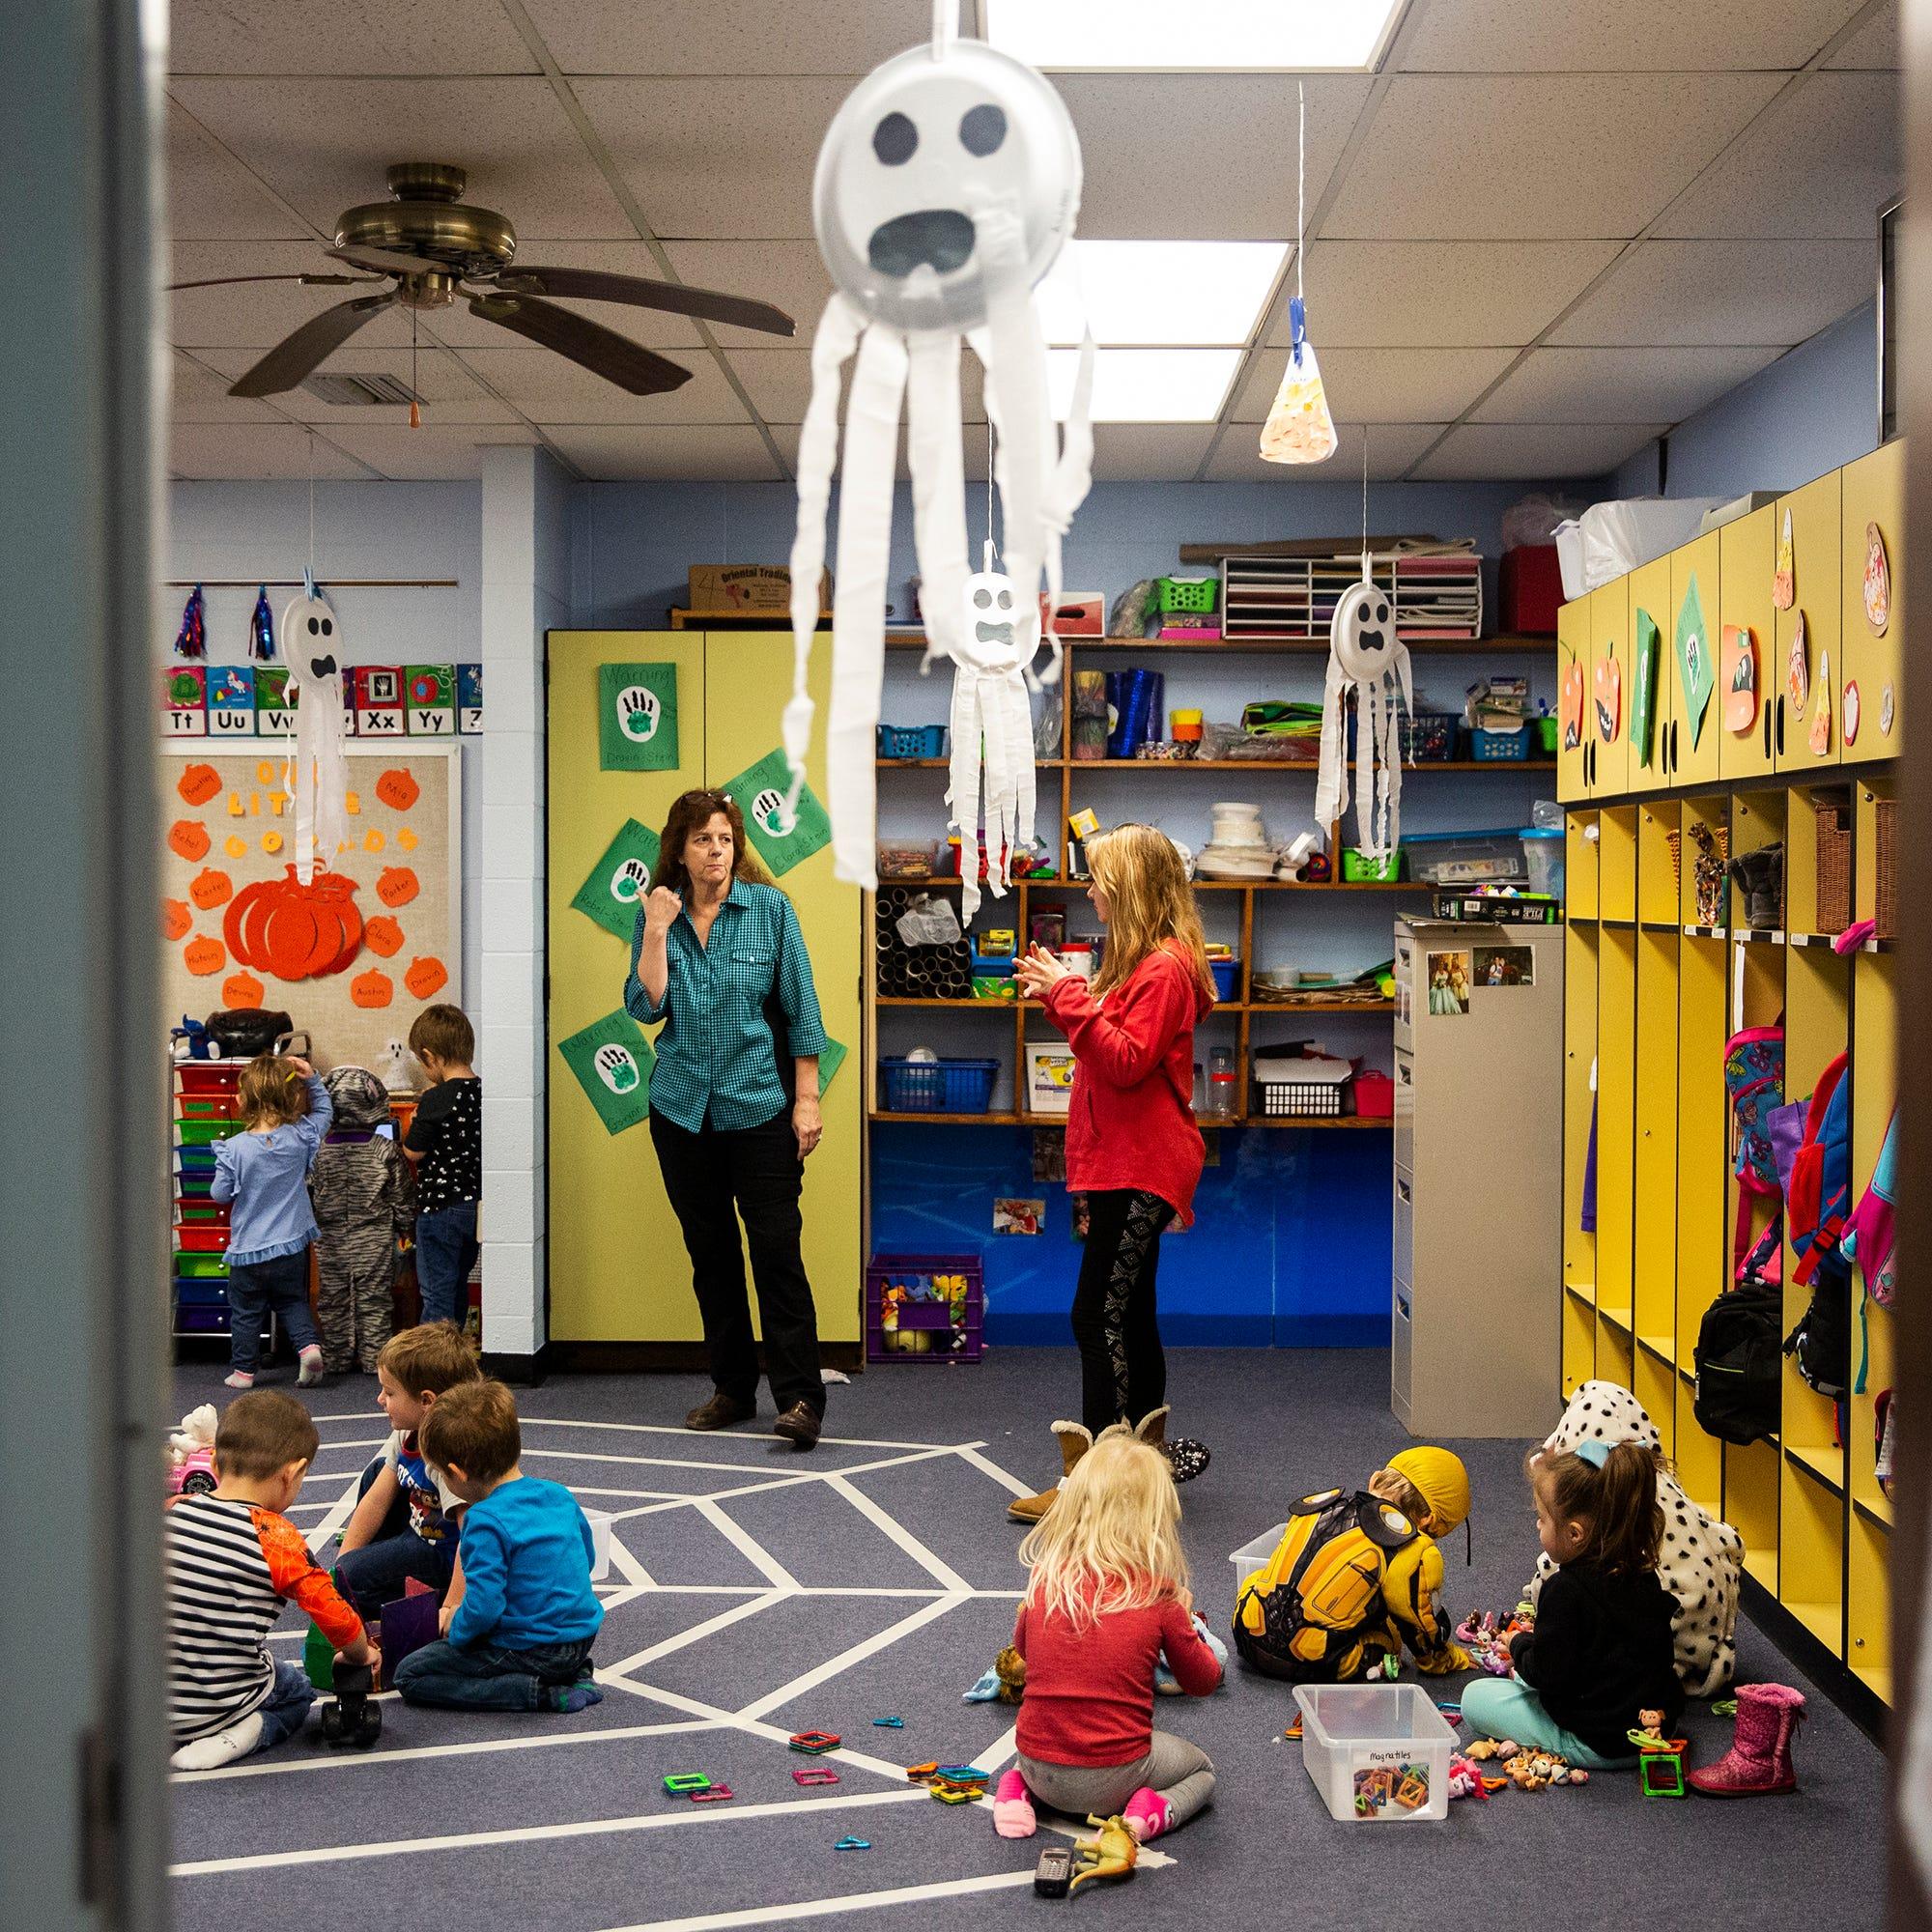 A creative partnership helps Curious Kids...